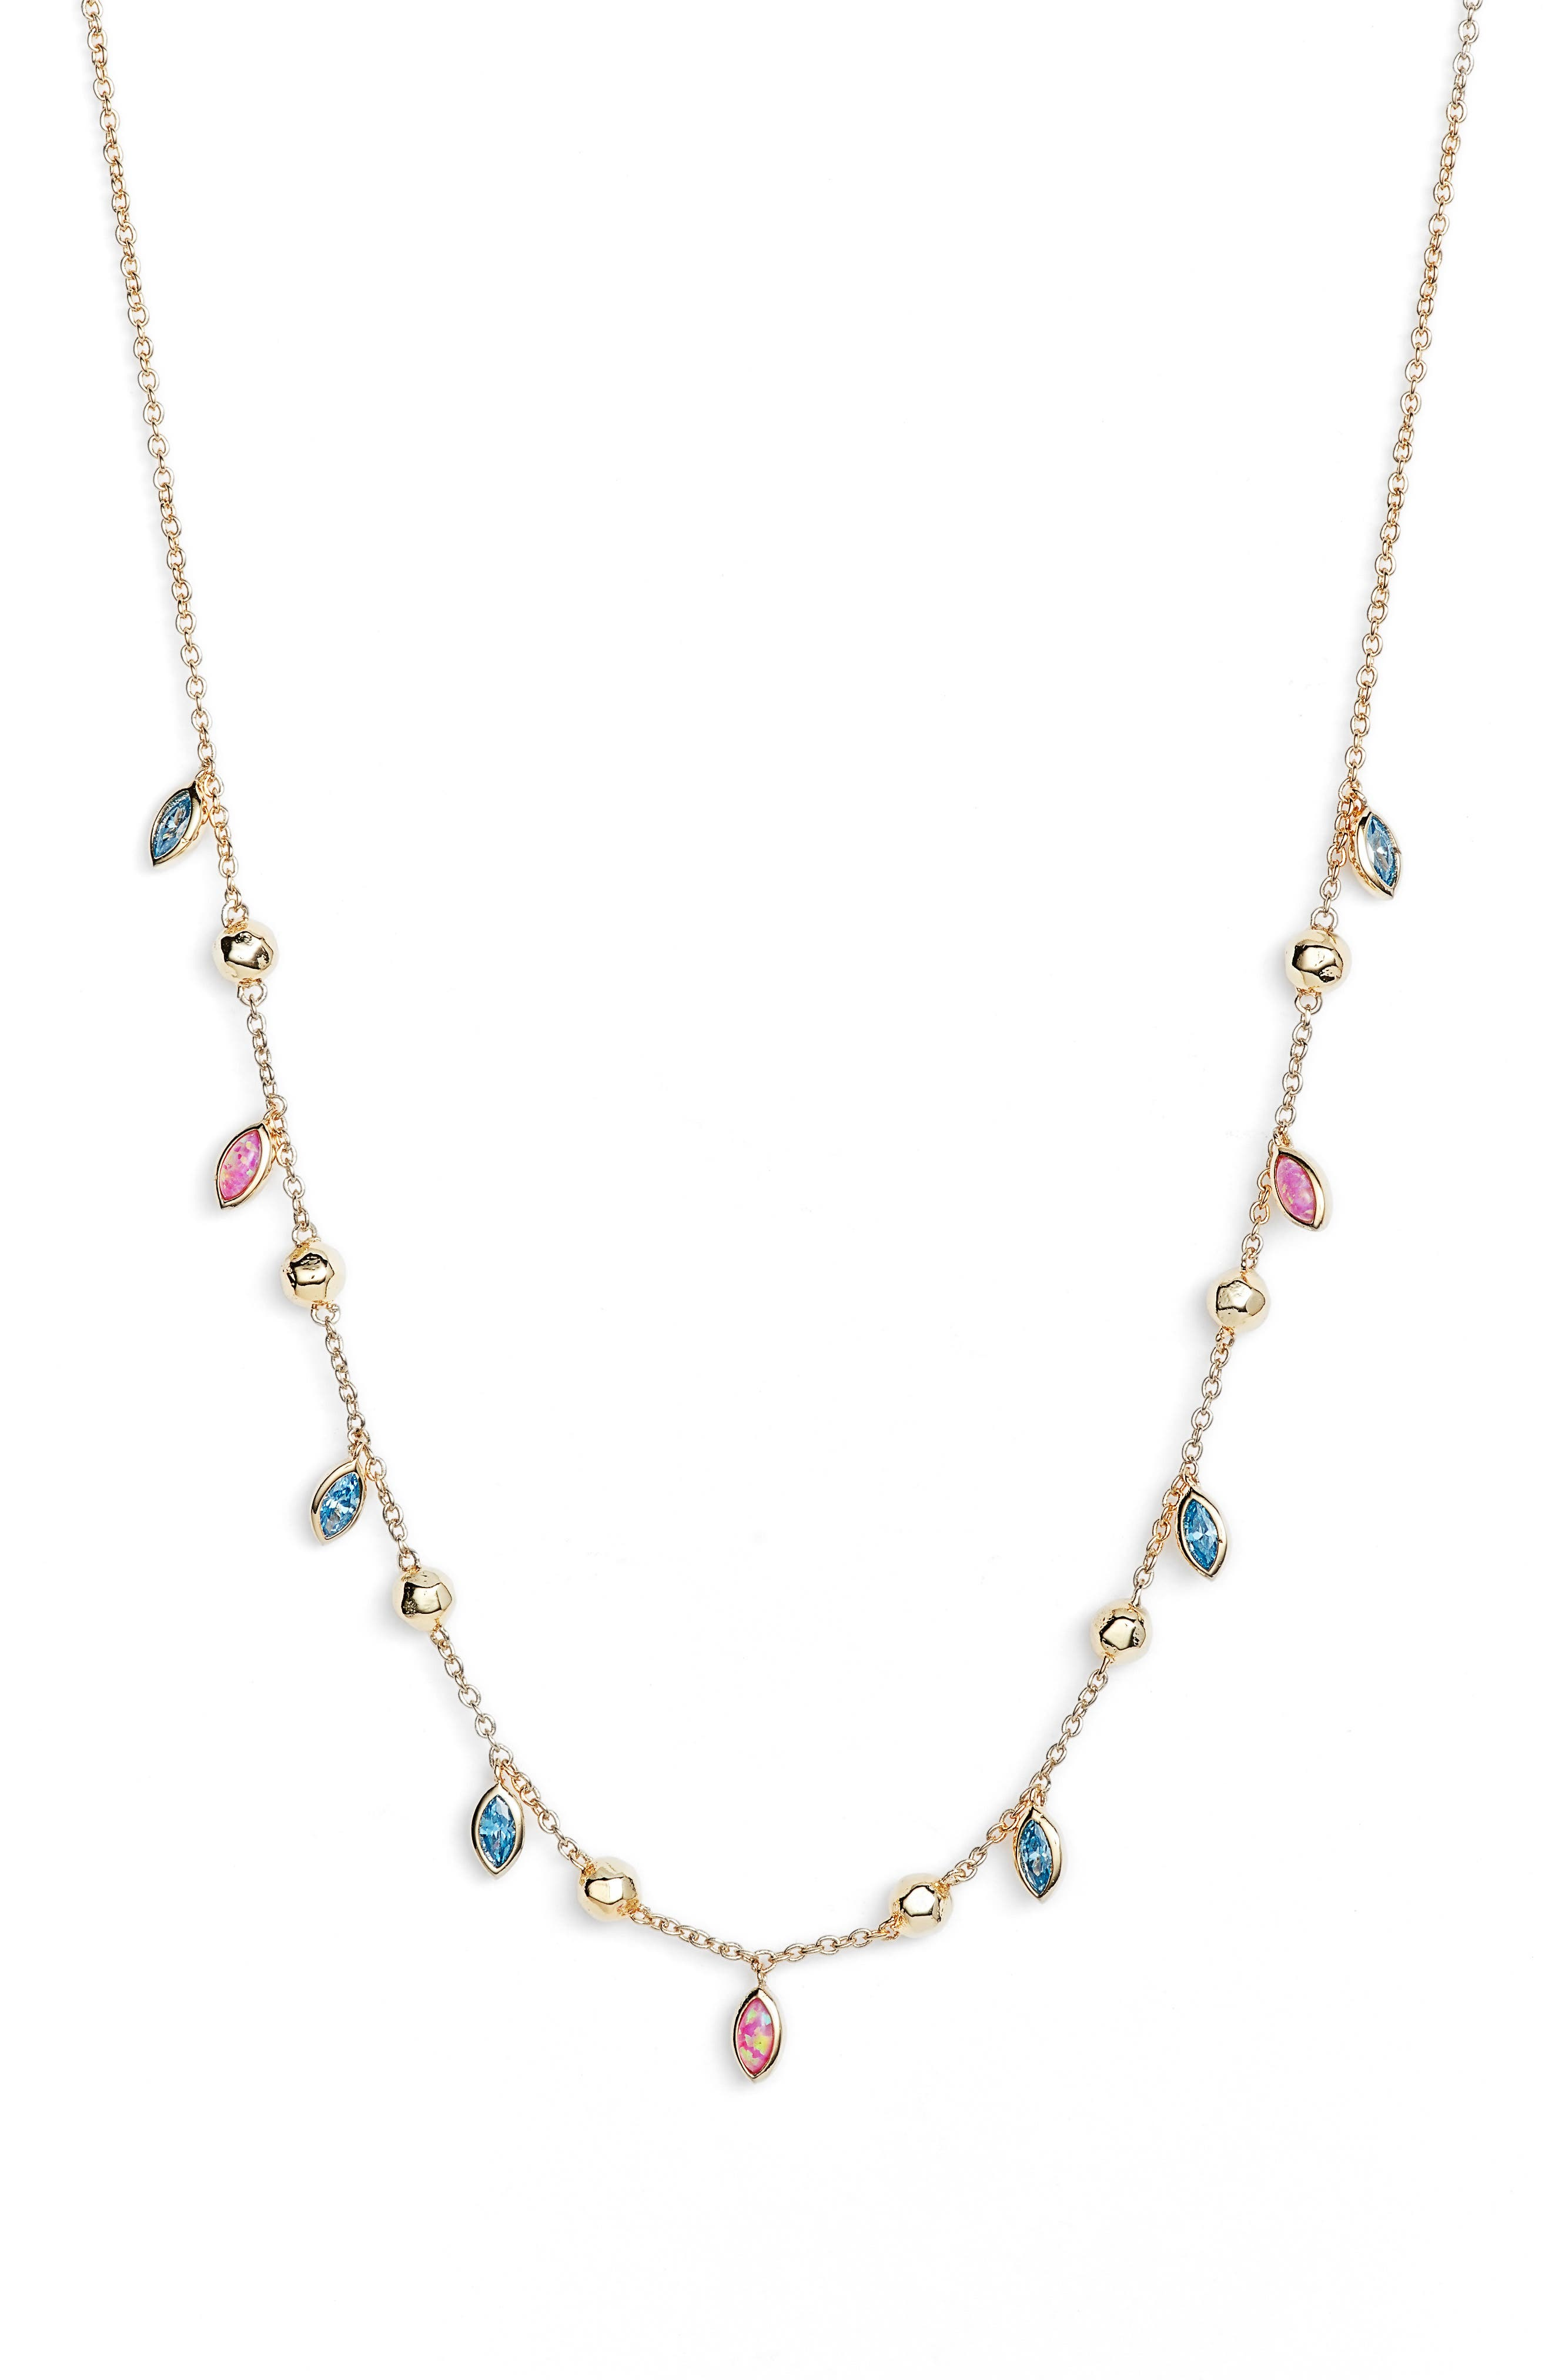 Gorjana Rumi Confetti Adjustable Necklace 9T9oPX